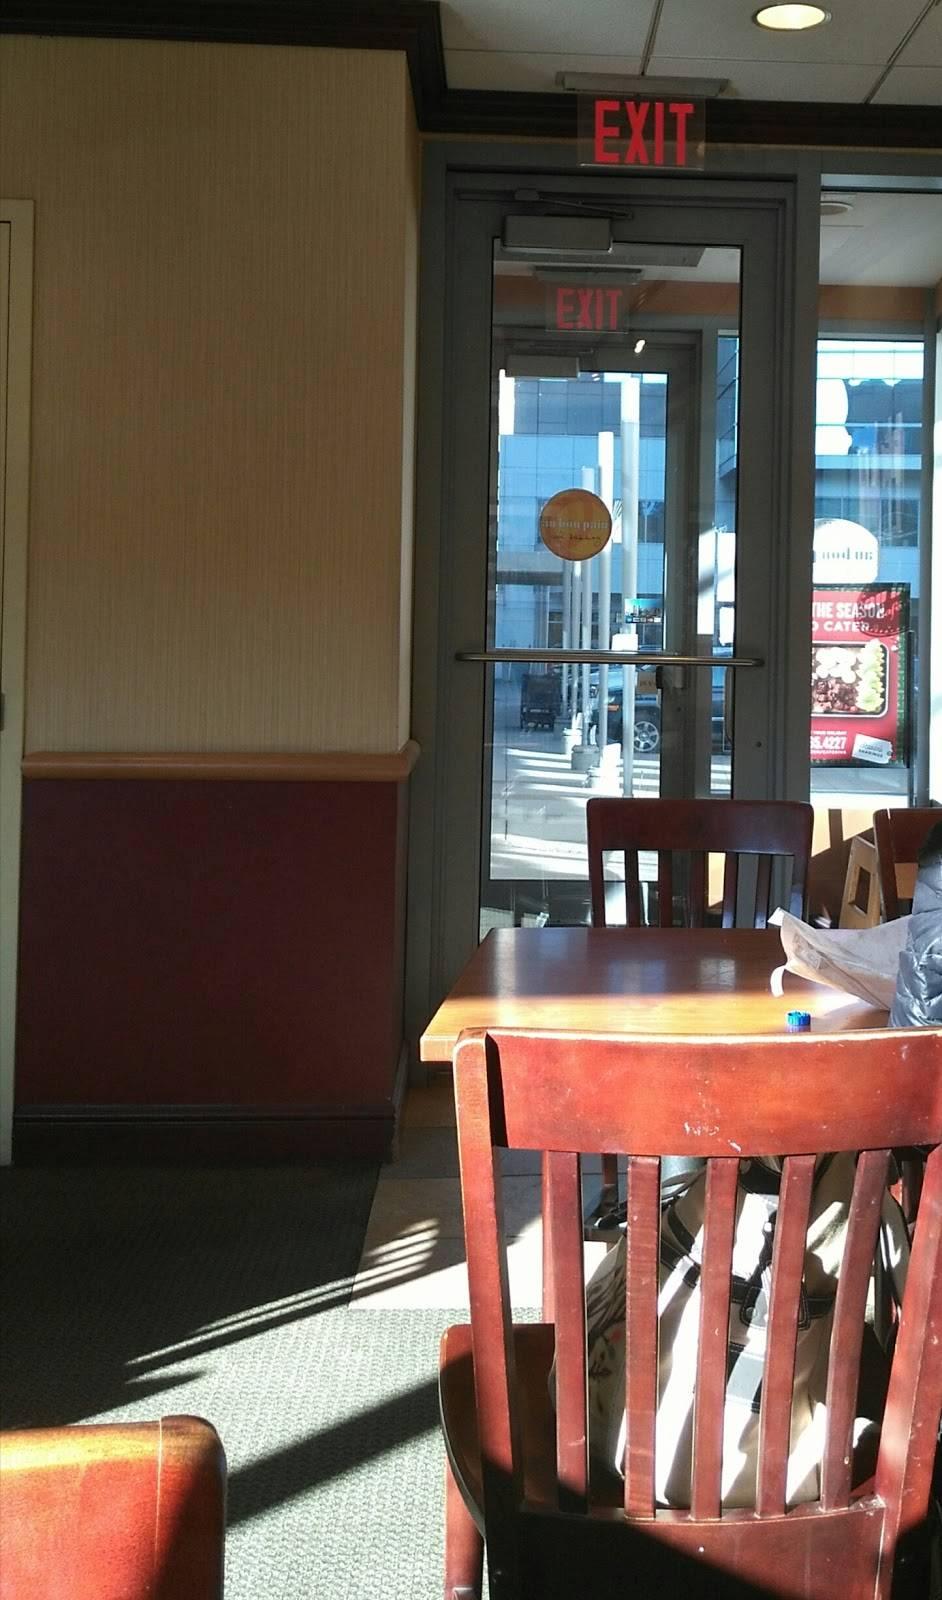 Au Bon Pain | bakery | Charles River Plaza, 209 Cambridge St, Boston, MA 02114, USA | 6177231278 OR +1 617-723-1278